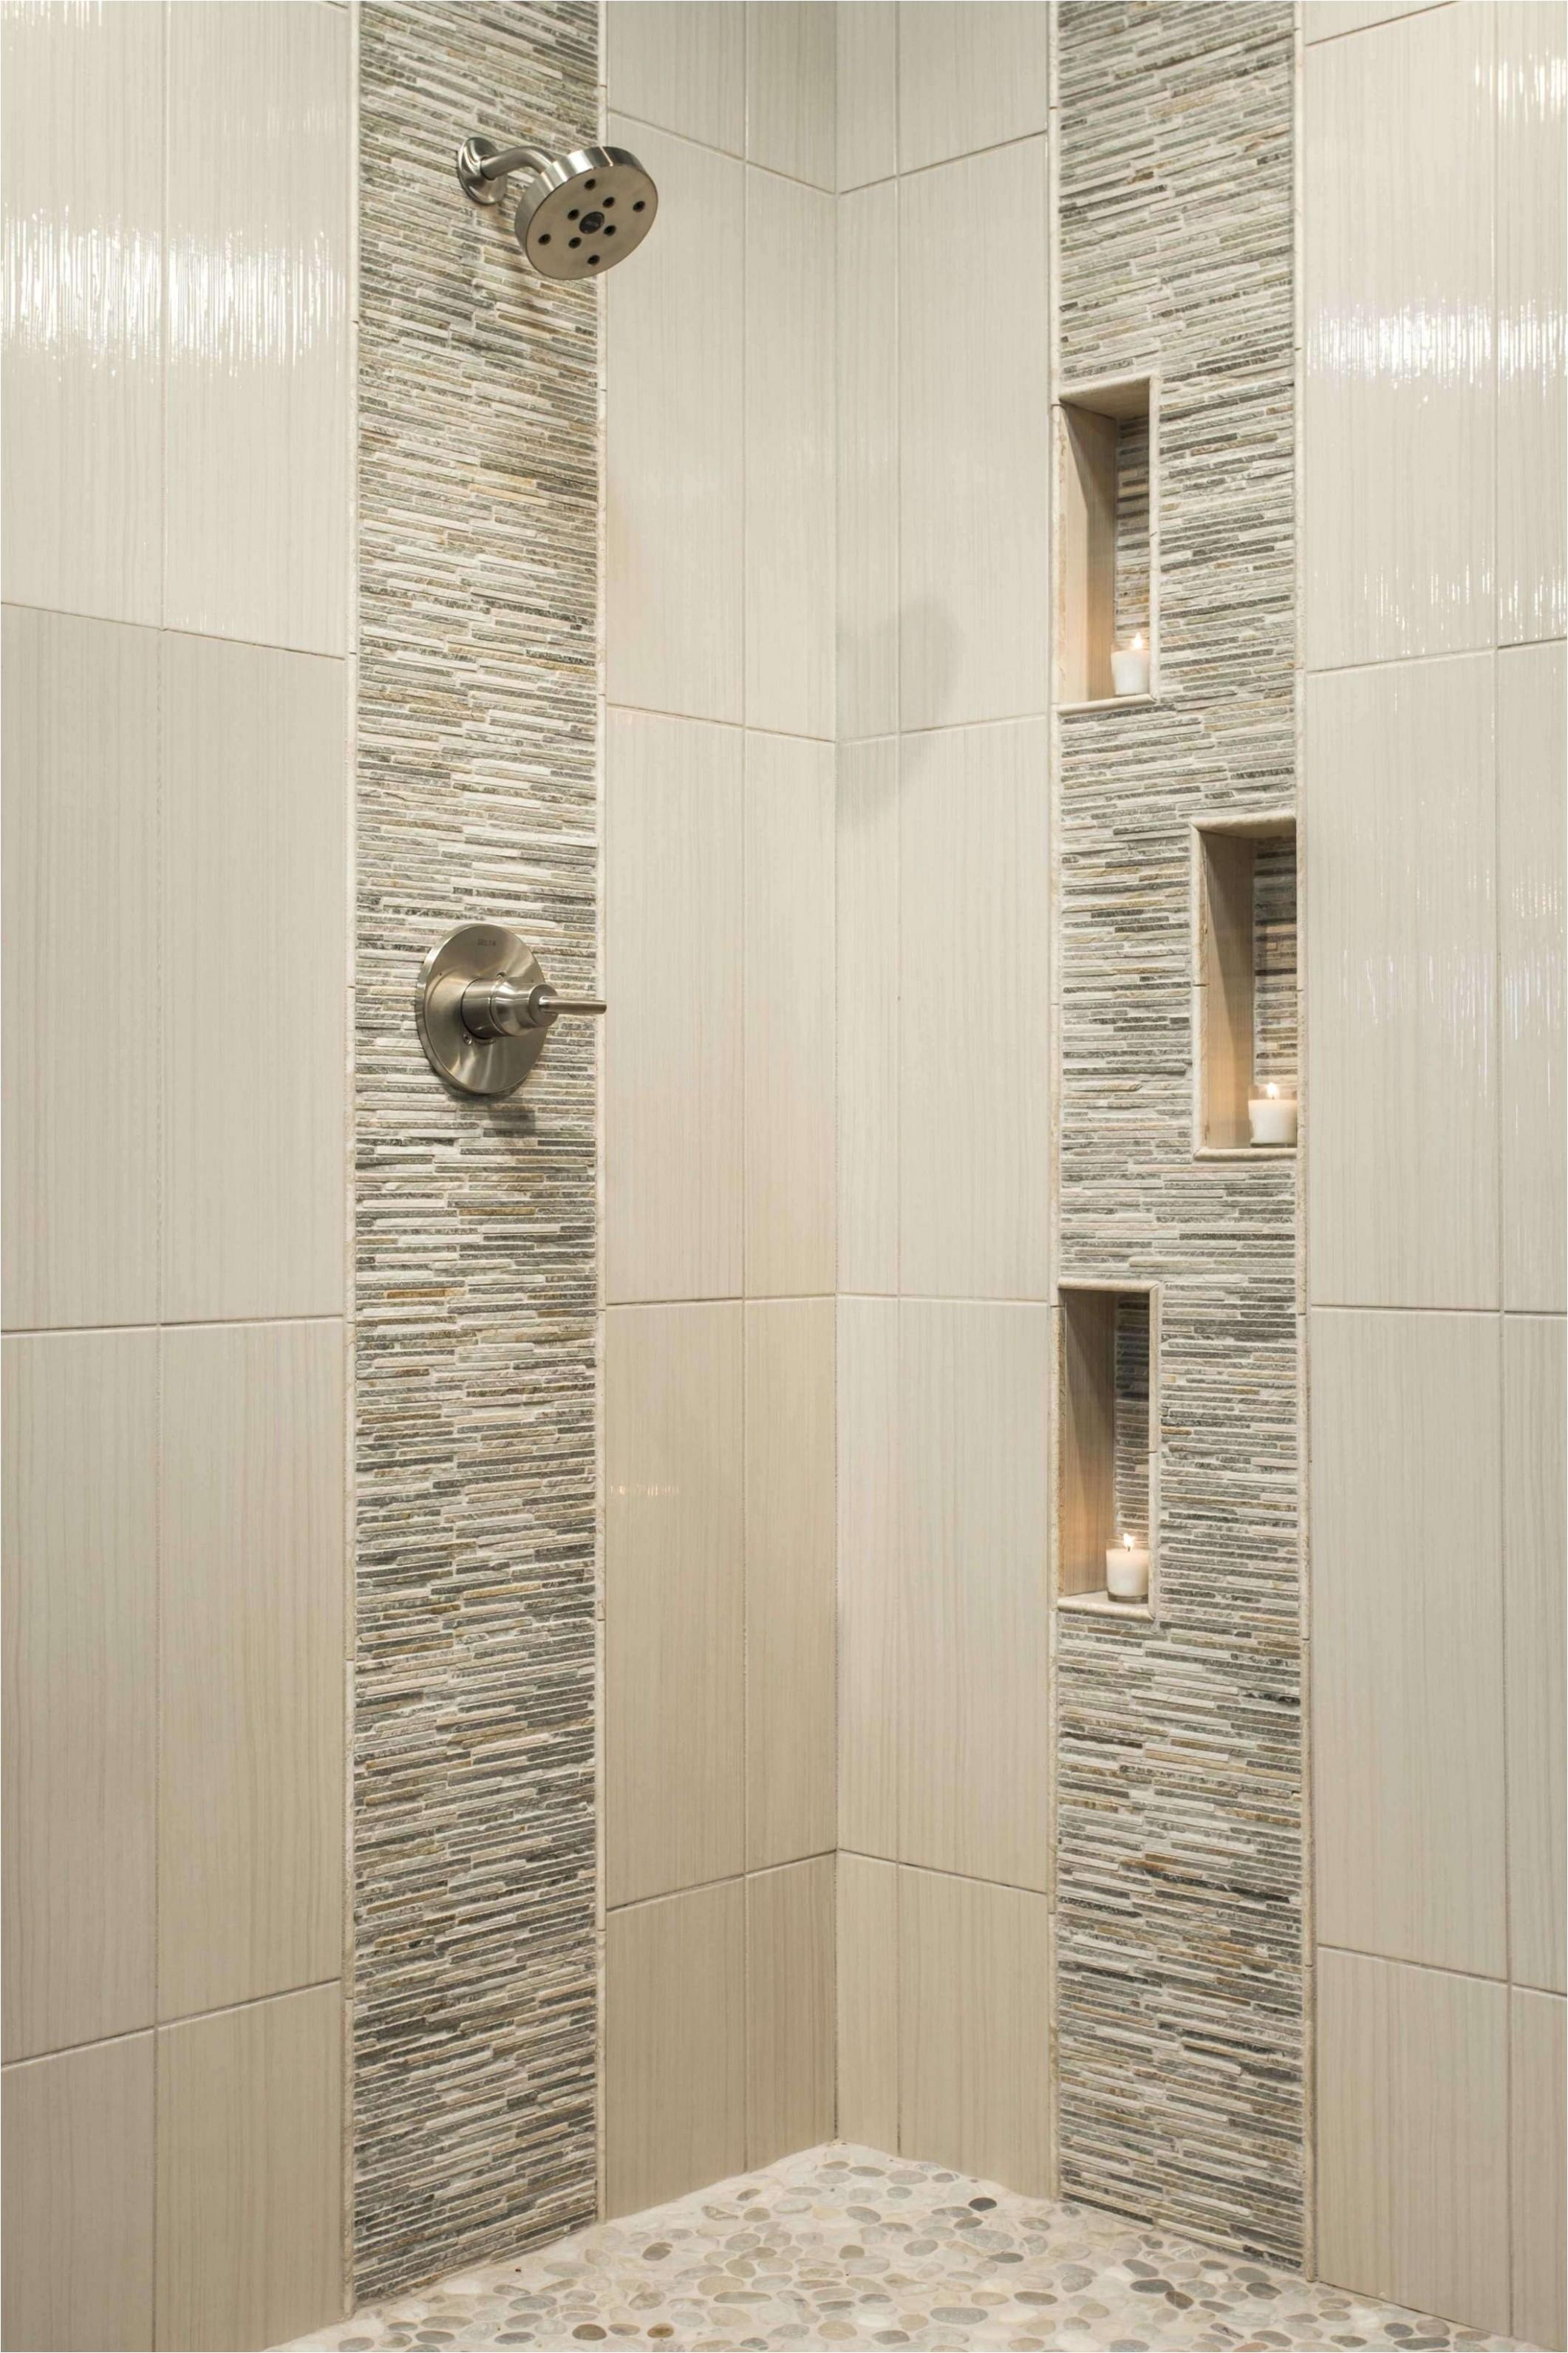 Tiles Designs For Bathrooms Valid Bathroom Floor Tiles Design Valid Floor Tiles Mosaic Bathroom 0d New